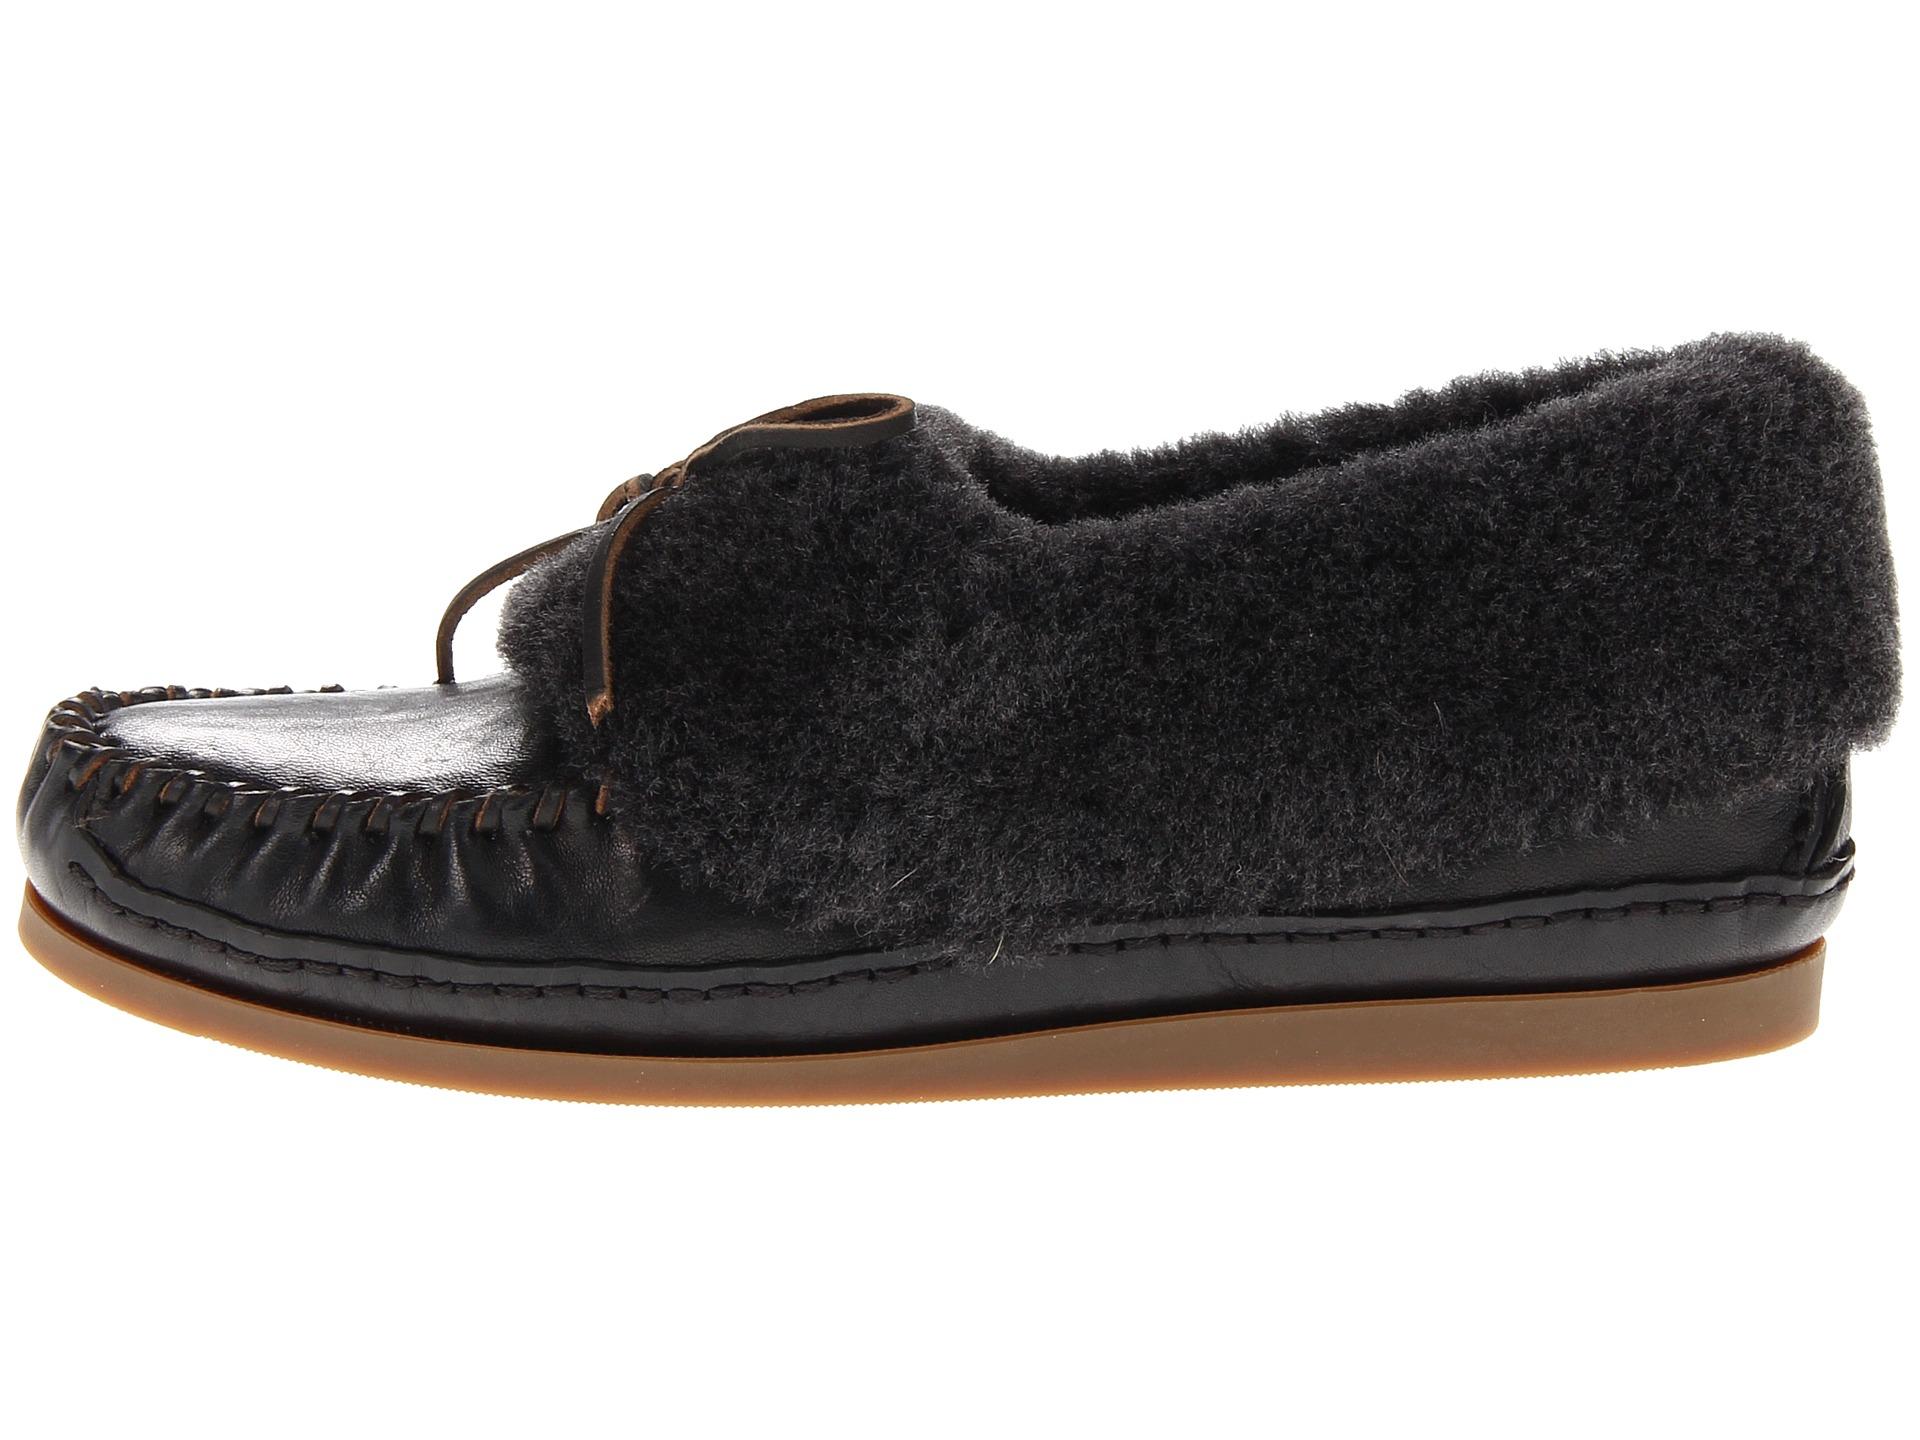 FRYE Black Slippers clearance authentic QgGP2Evb